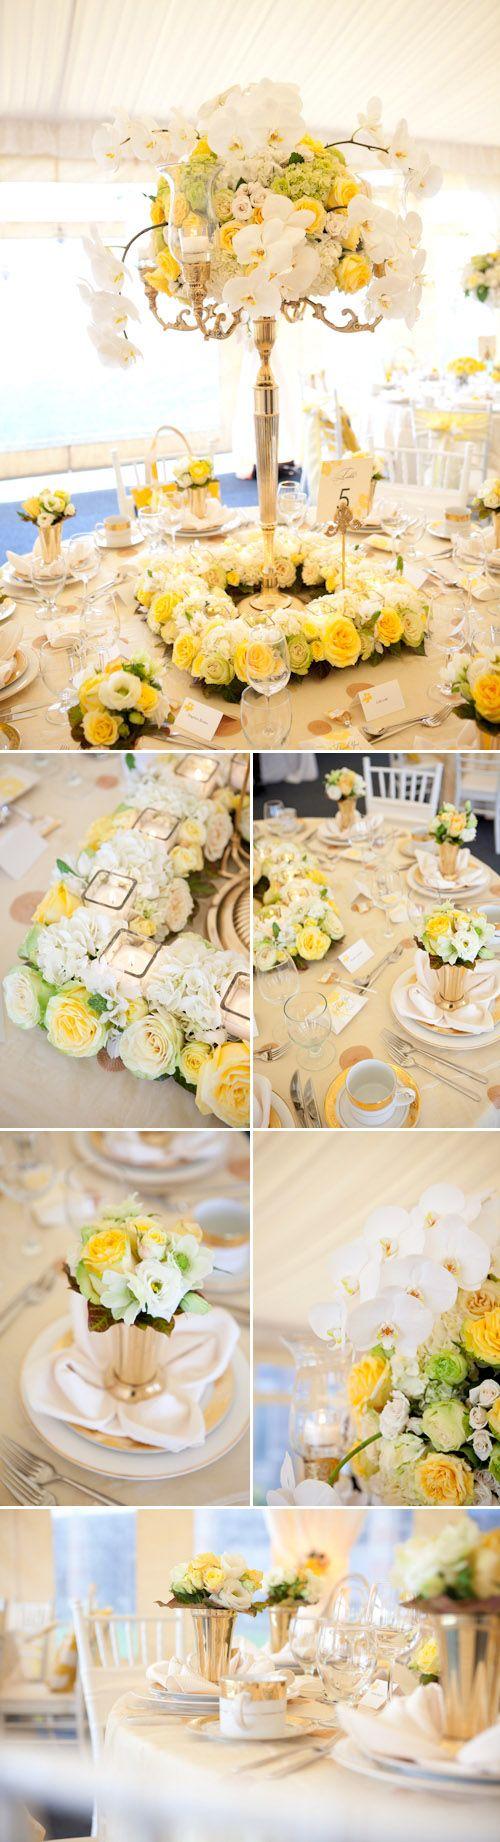 Wedding decorations yellow and gray   best Yellow u White Wedding images on Pinterest  Wedding ideas